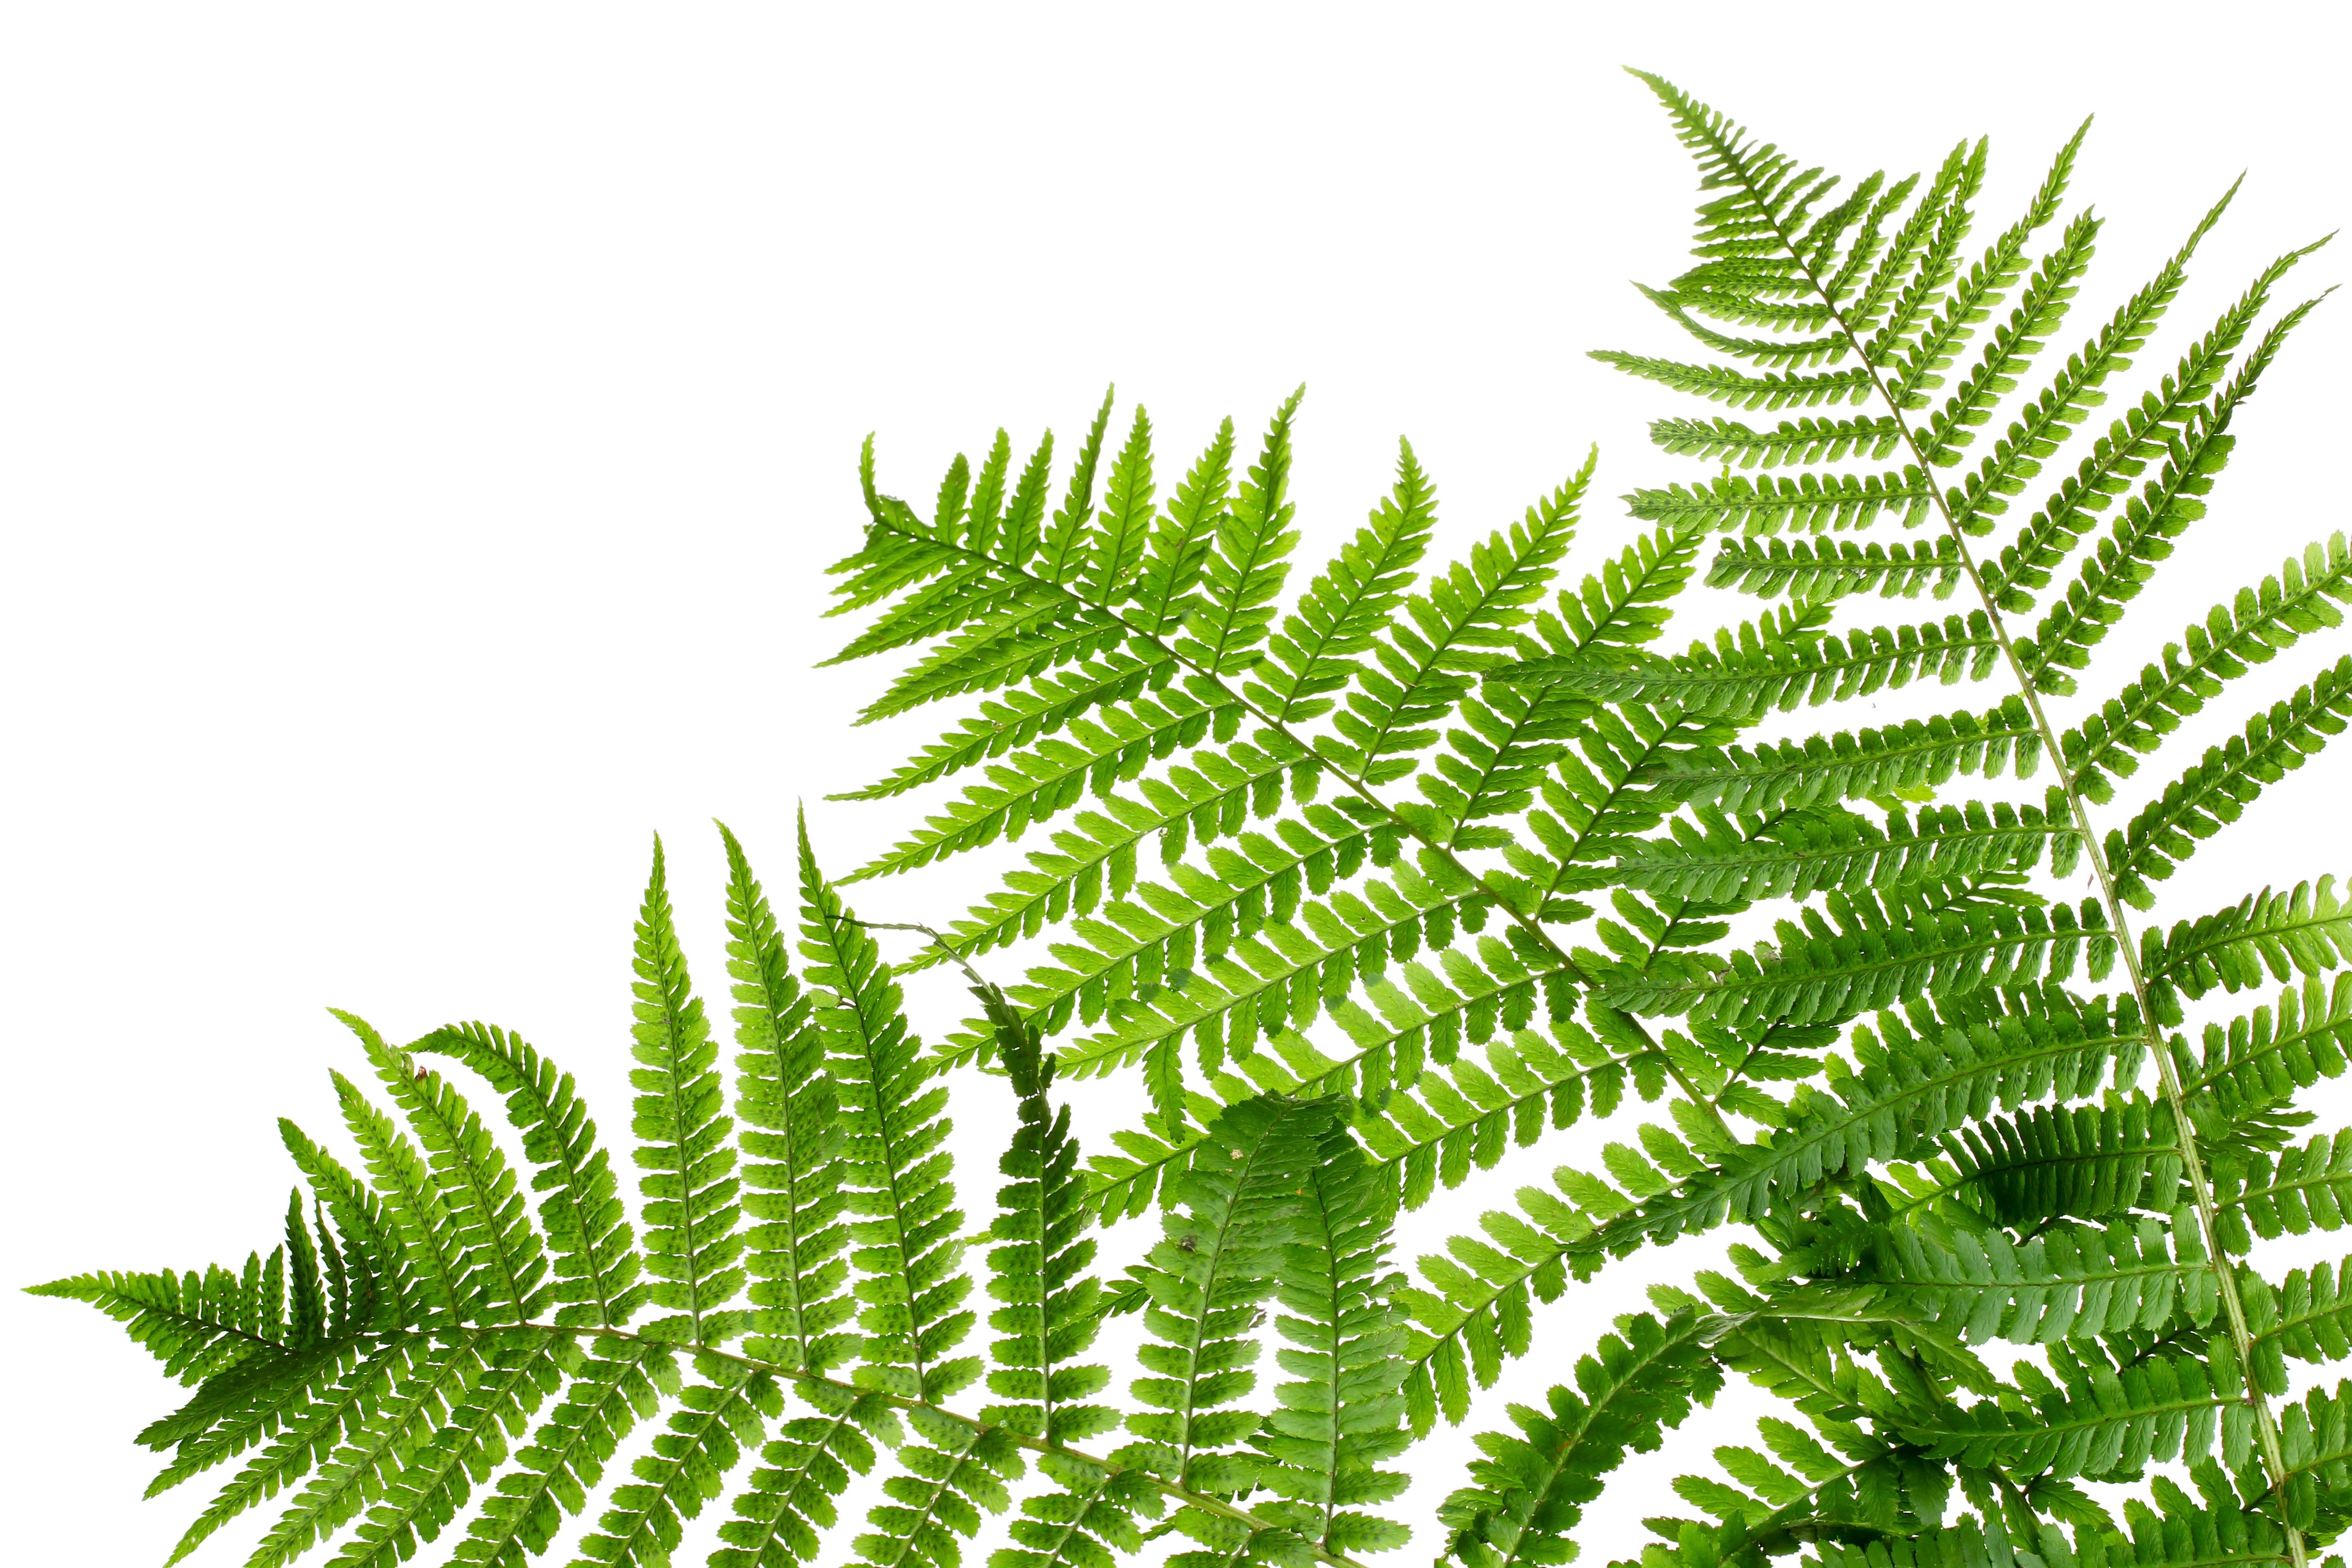 Diy Pressed Plants Ashley Furniture Homestore Blog